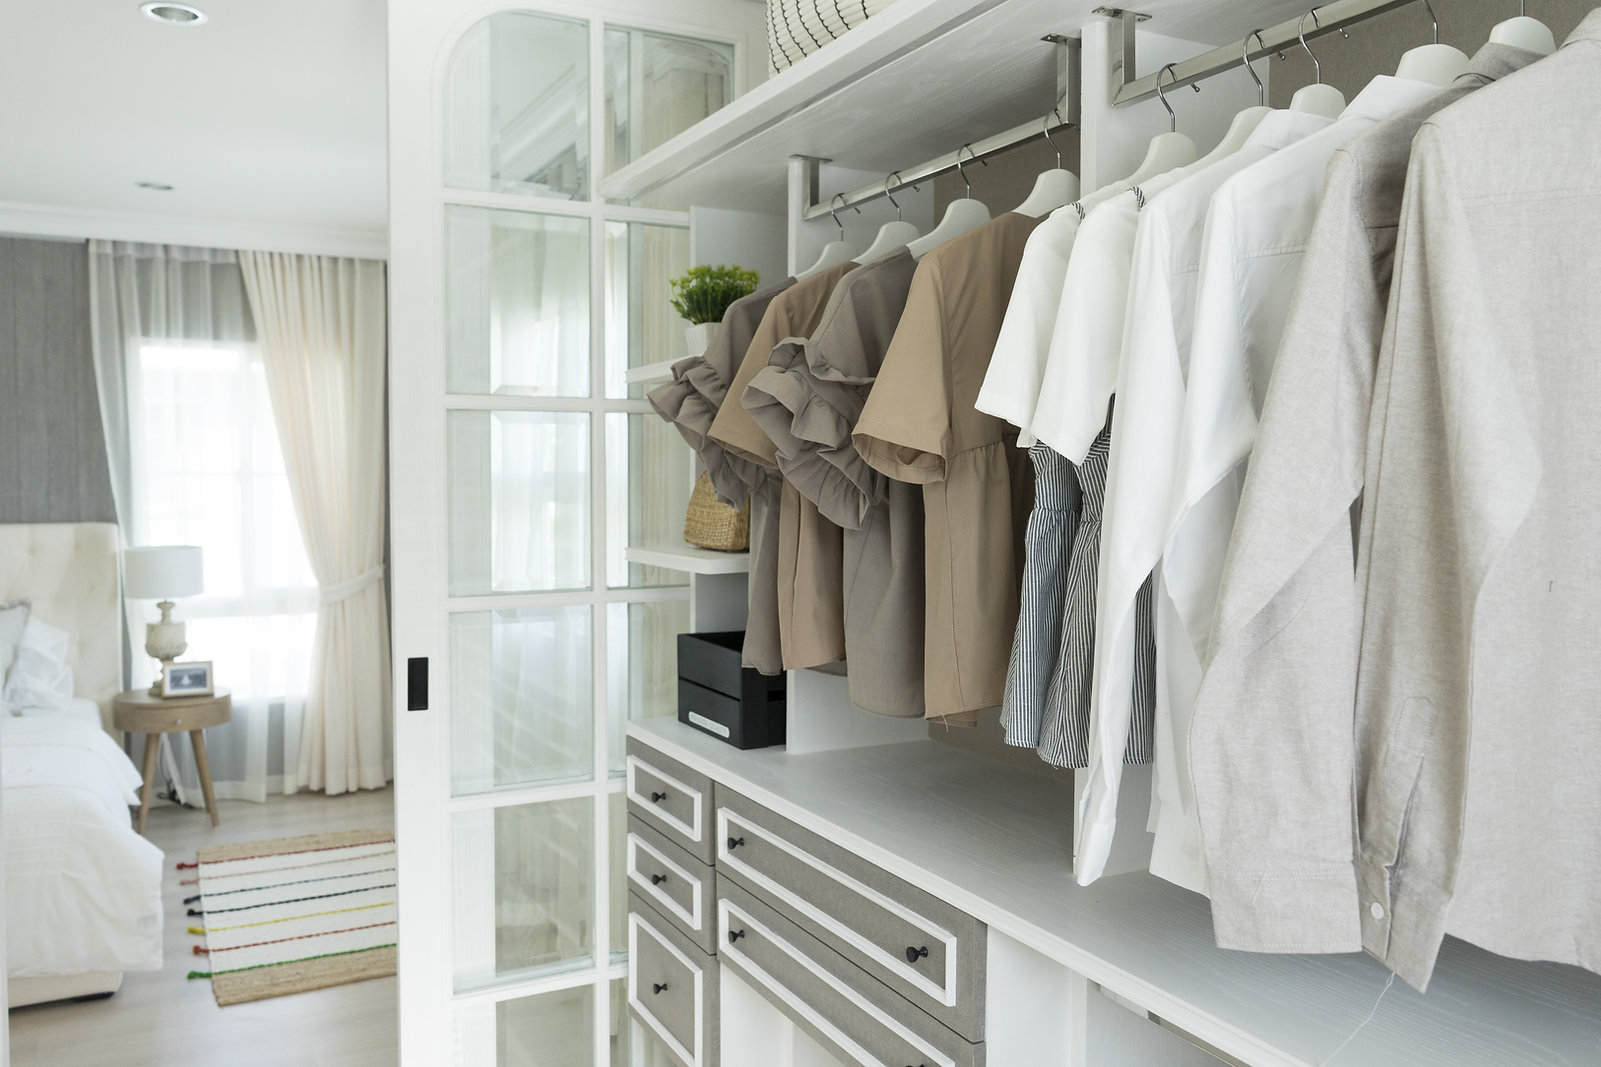 closet with cloth and shelf at home.jpg